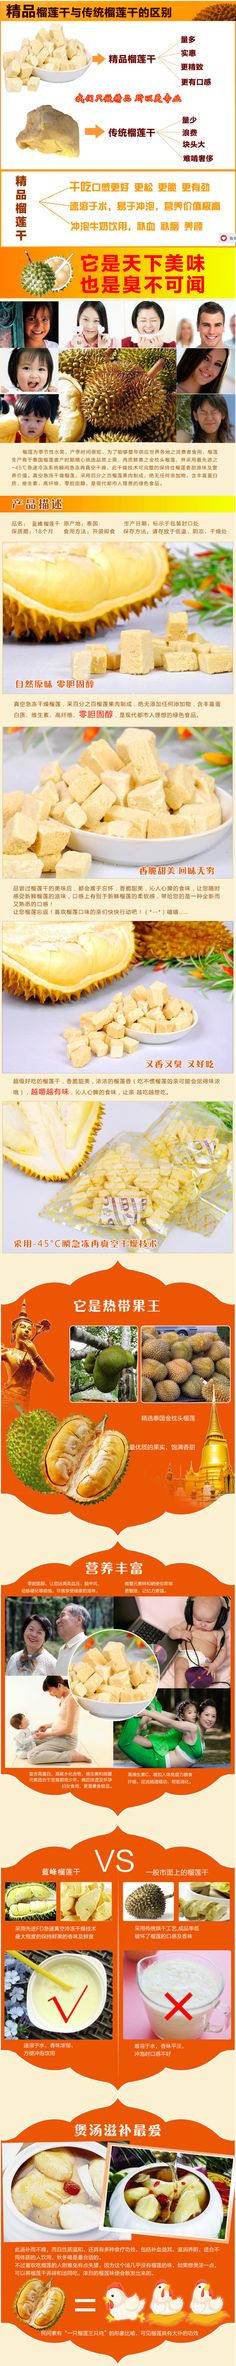 dried durian 200g 45$